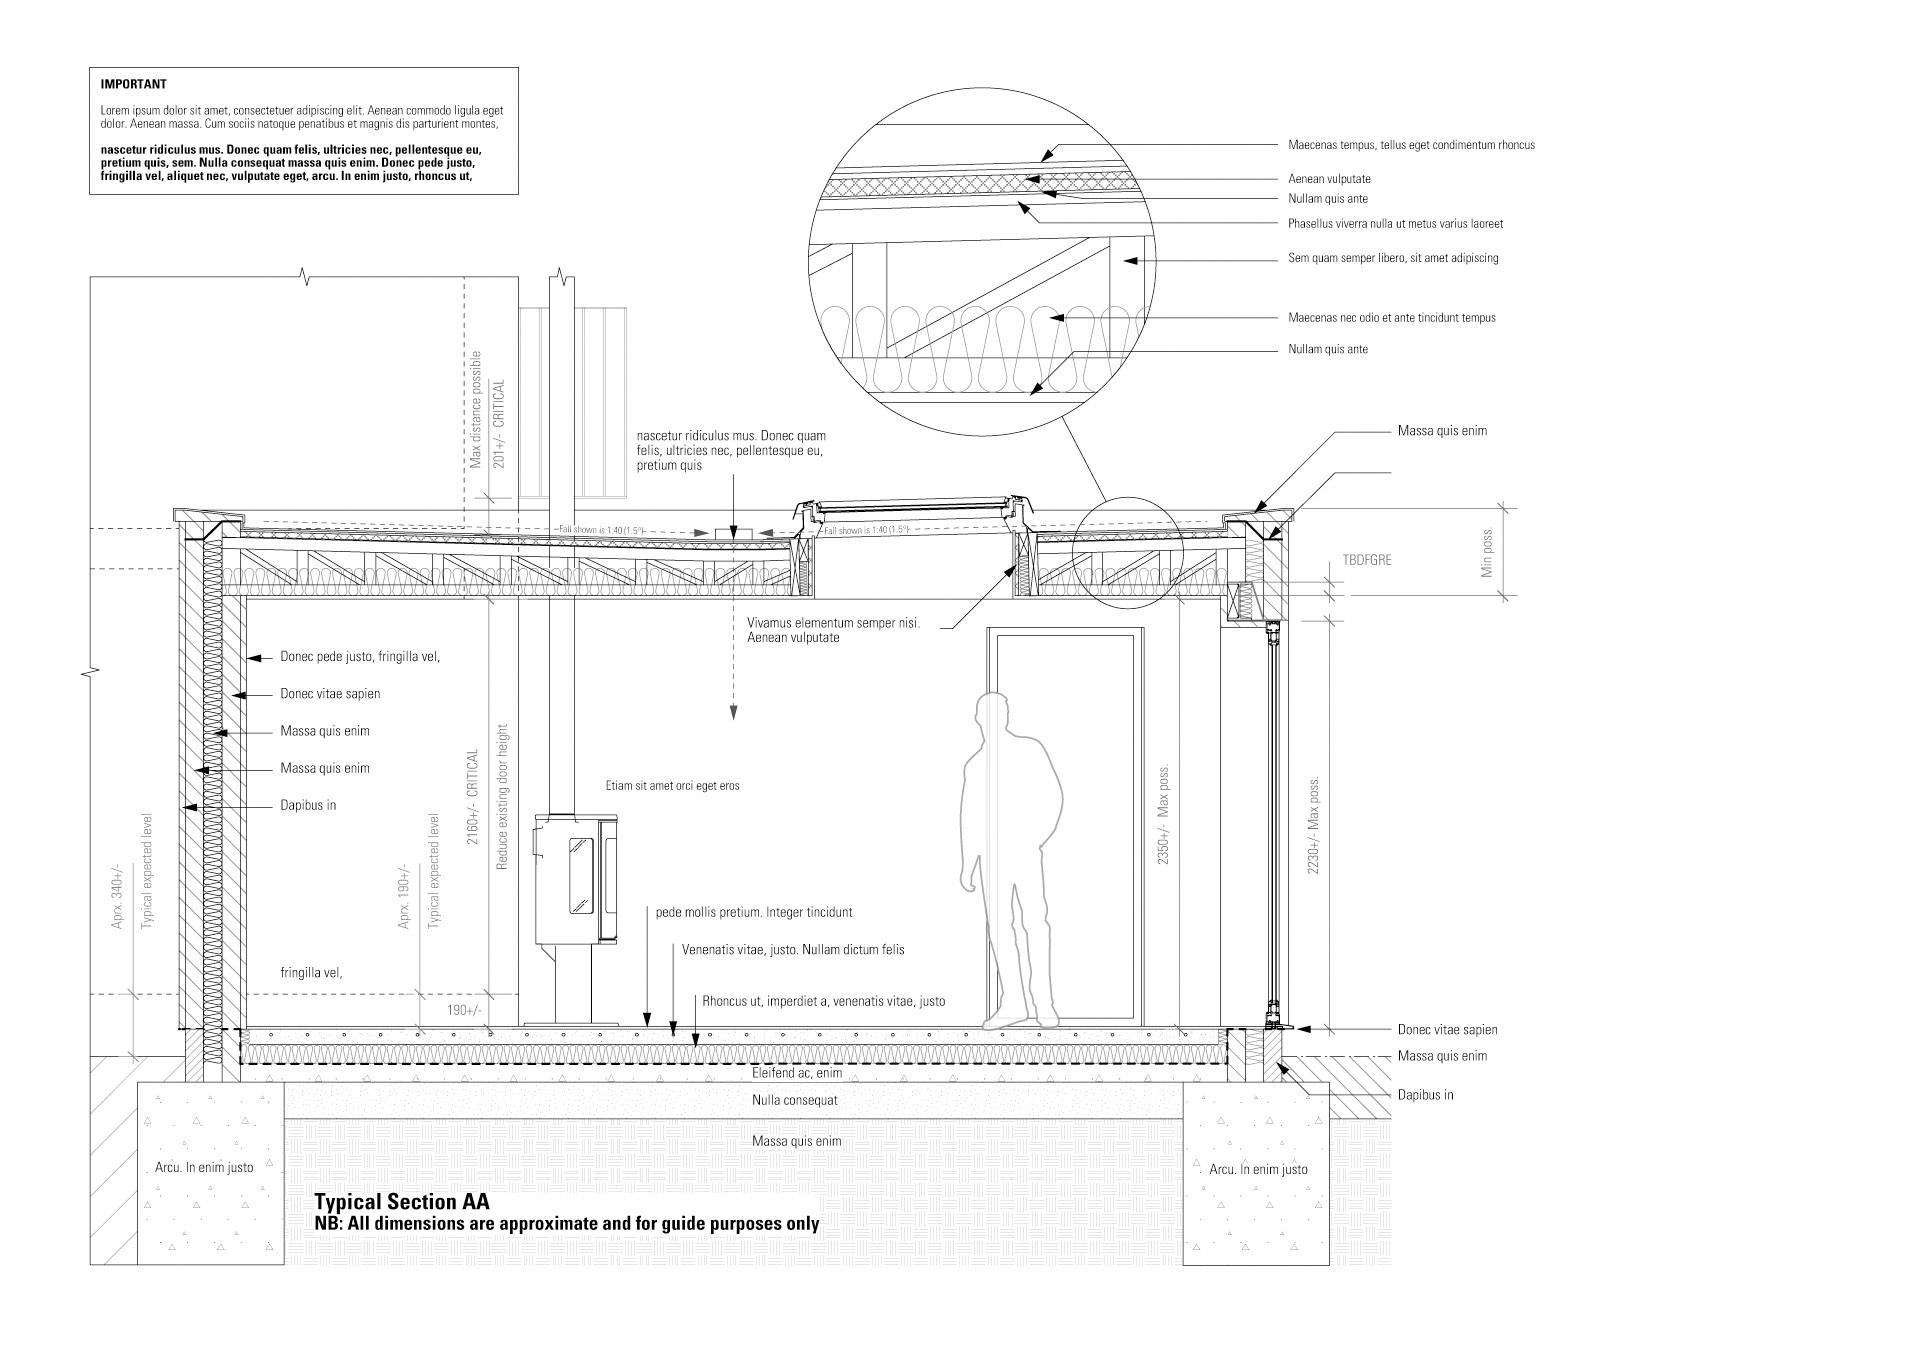 14 203 06E Section AA copy.jpg